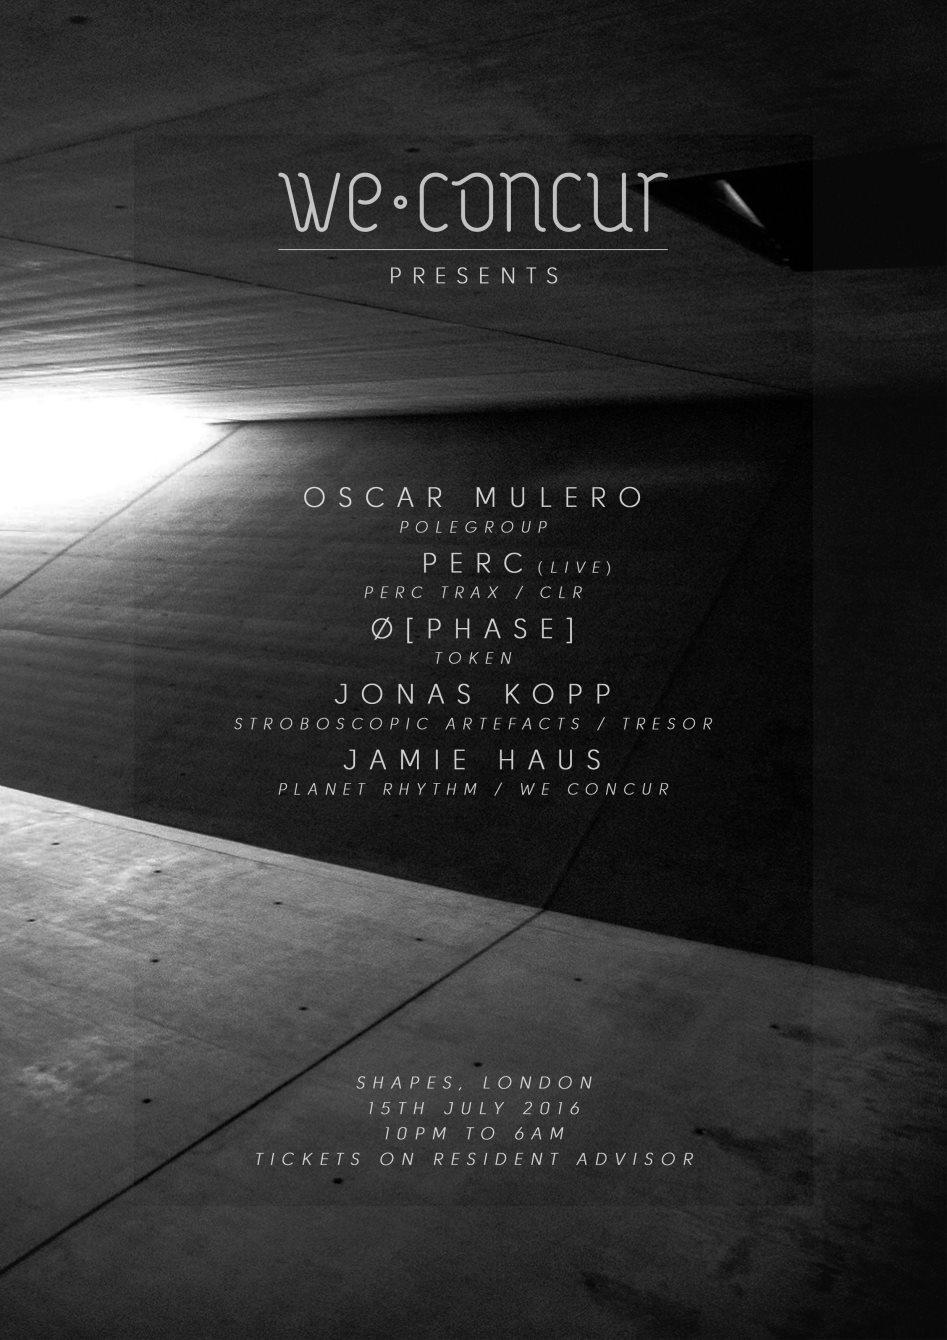 We Concur presents Oscar Mulero, Perc, Ø [Phase], Jonas Kopp, Jamie Haus - Flyer back